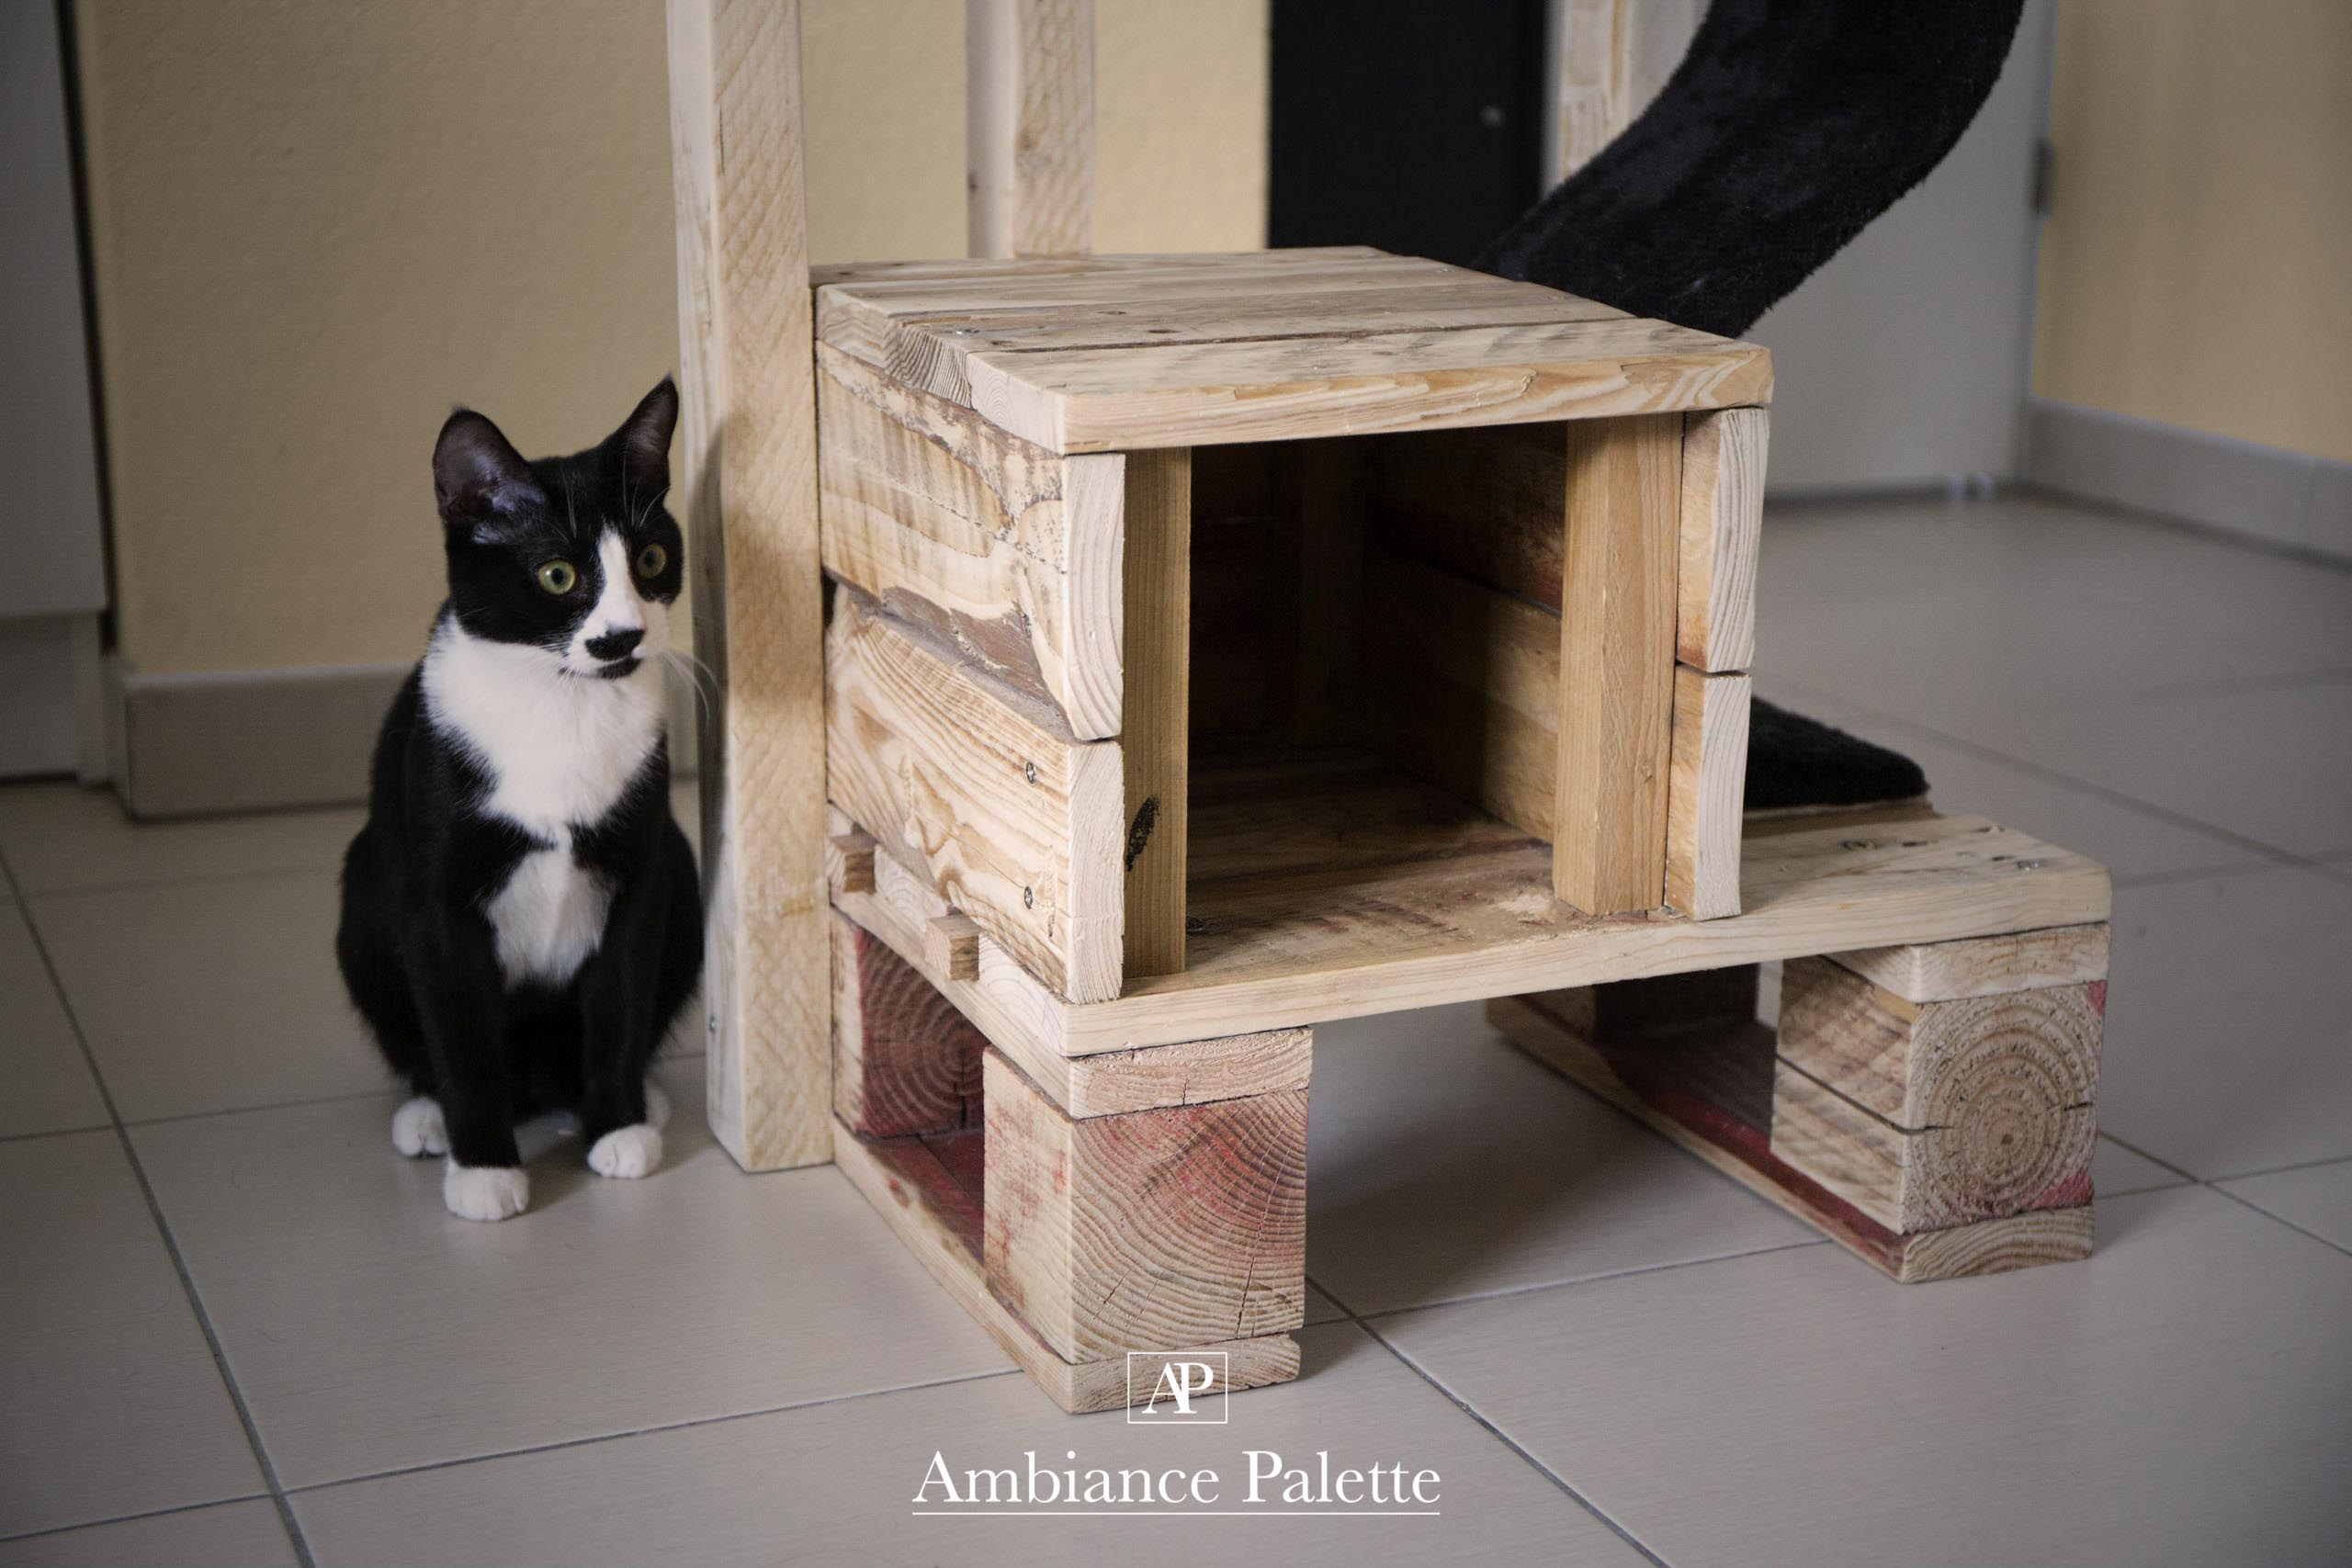 arbre chat ambiance palette. Black Bedroom Furniture Sets. Home Design Ideas